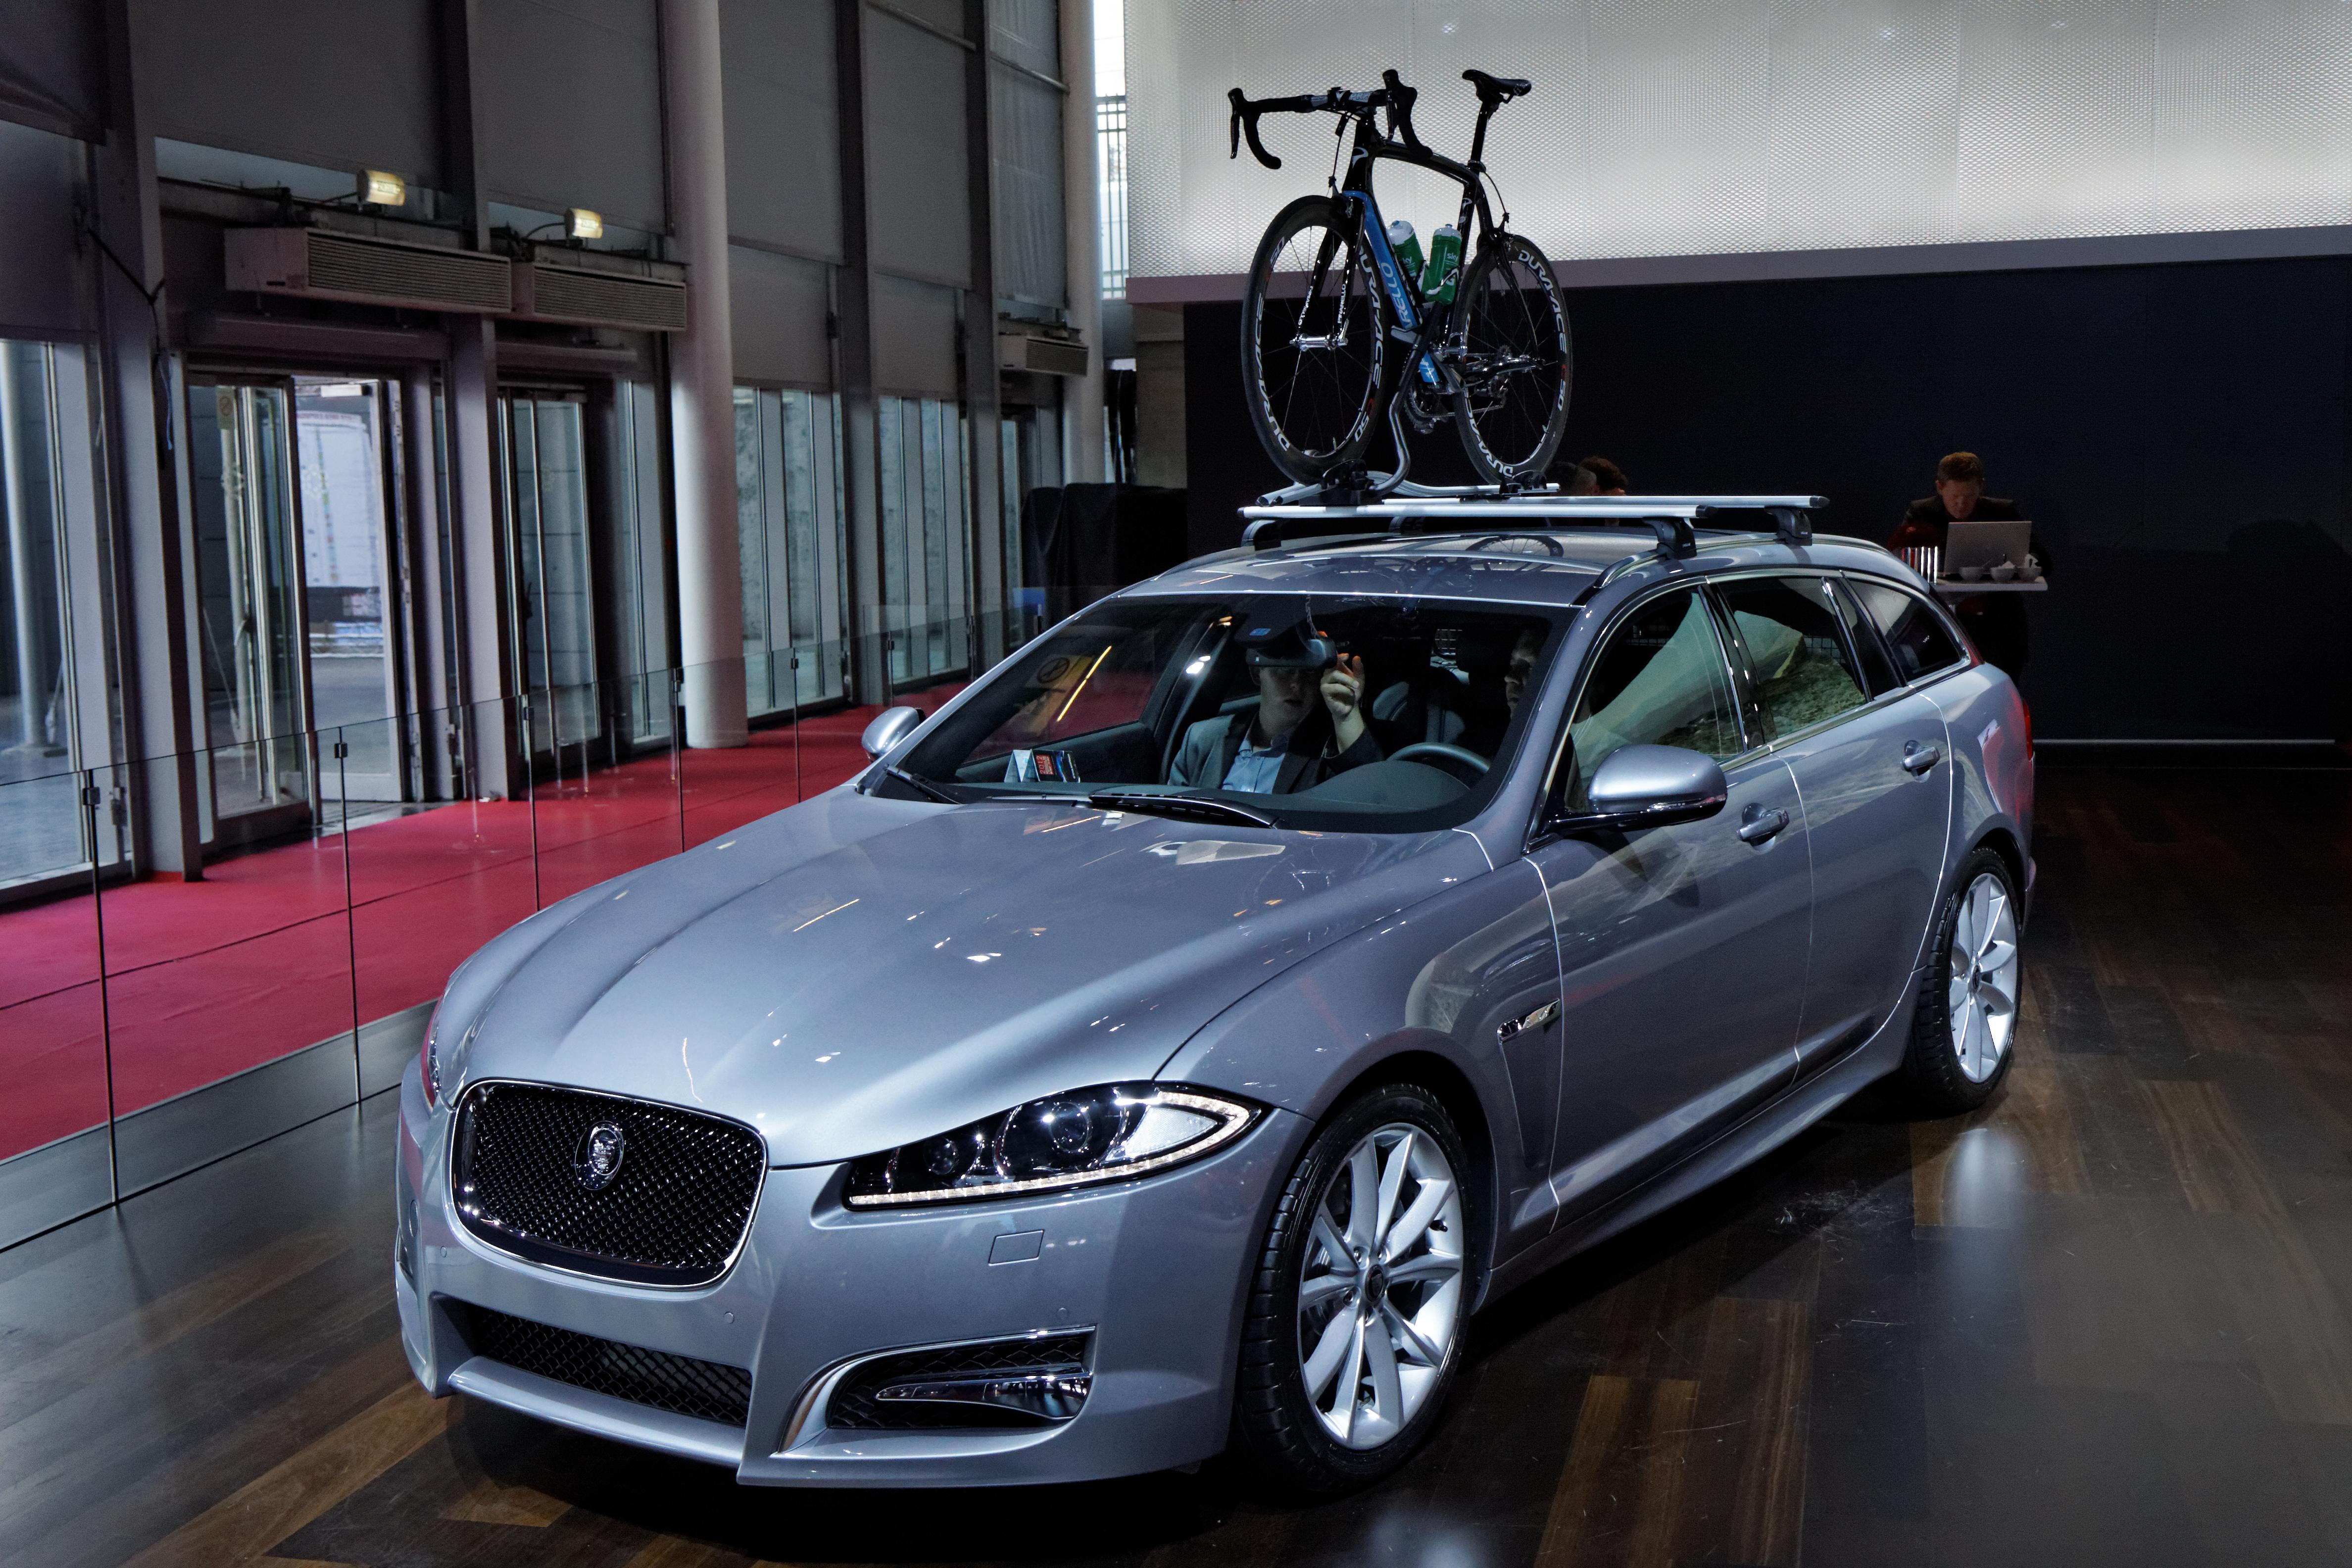 home cars xf img auto used bonita portfolio westcoast jaguar to